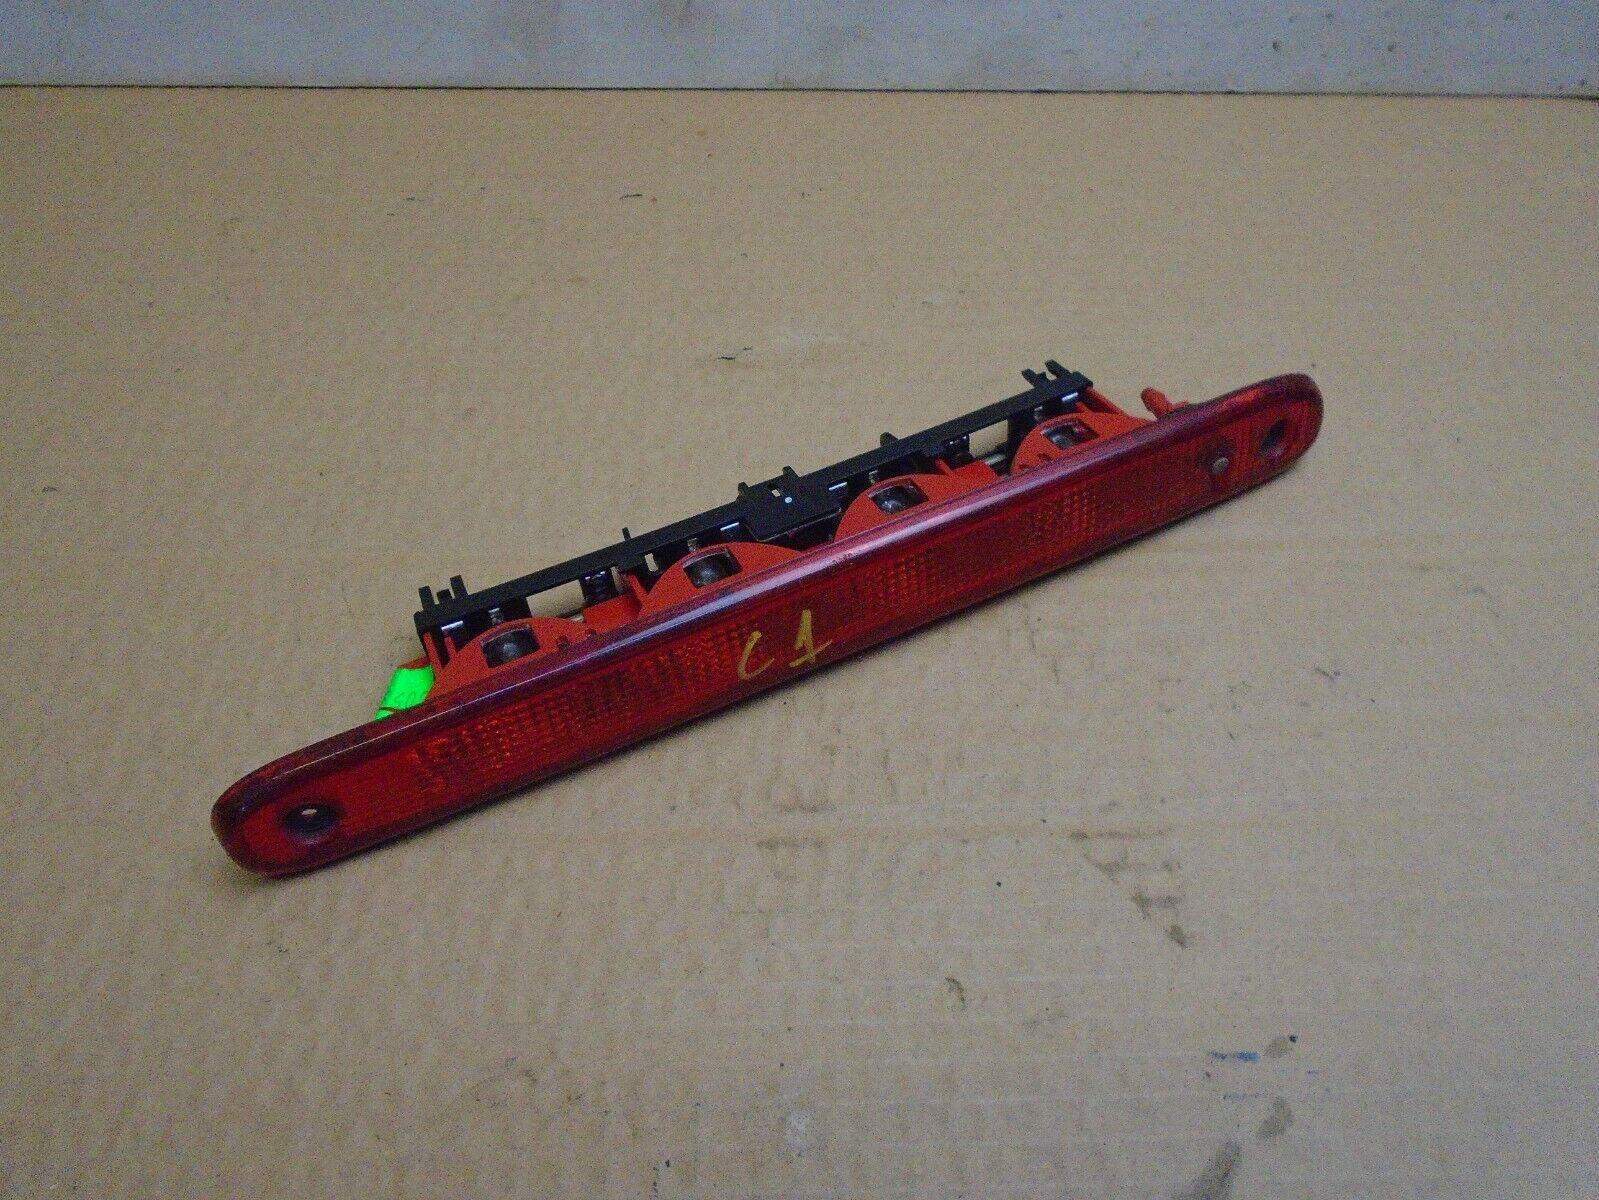 Car Parts - CITROEN C1 PEUGEOT 107 MK1 (2005-14) HIGH LEVEL BRAKE LIGHT E204017